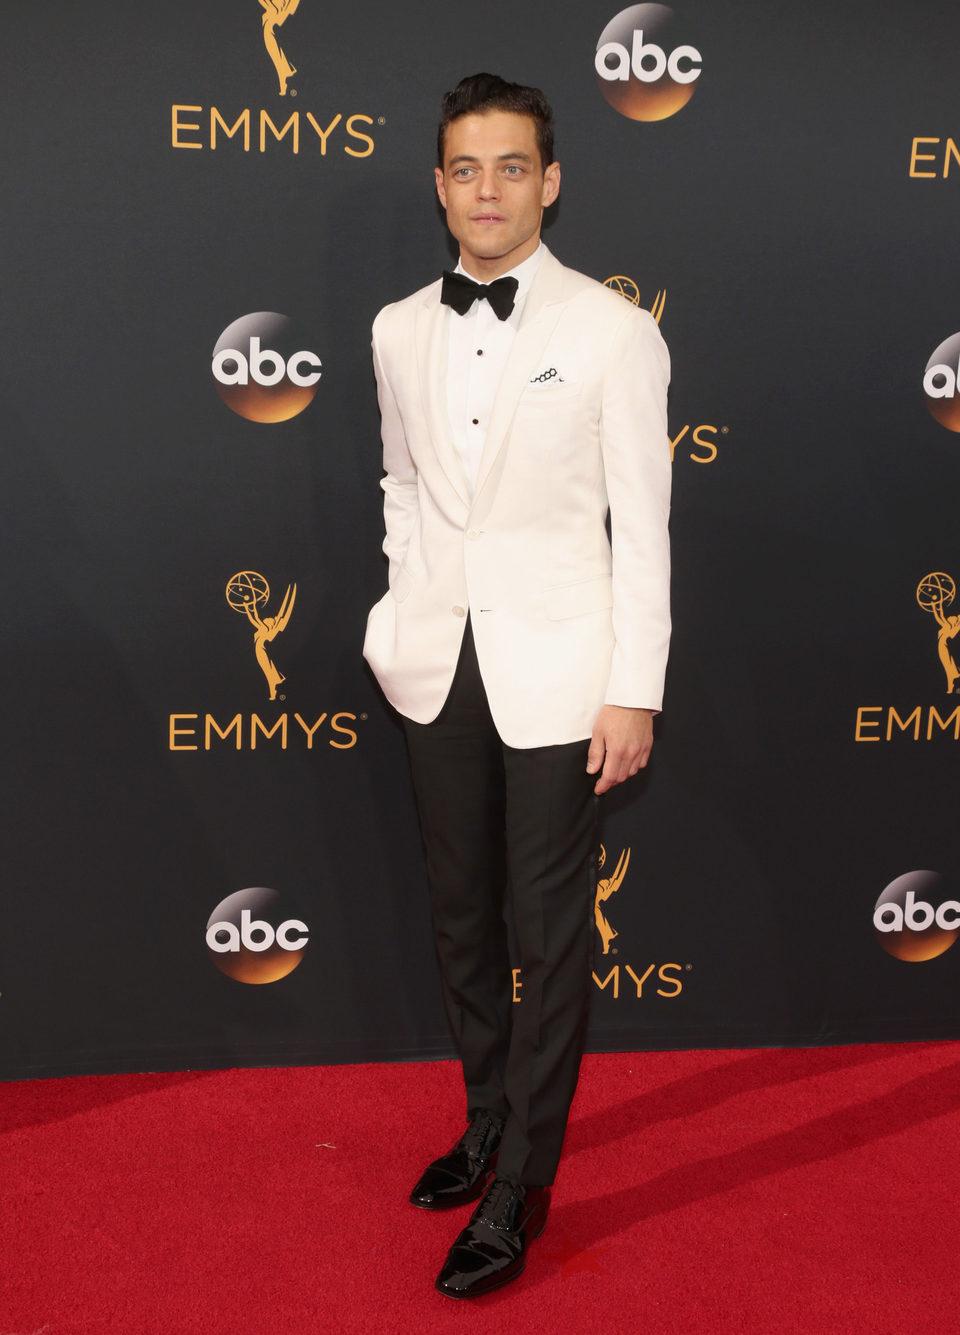 Rami Malek at the Emmys 2016 red carpet